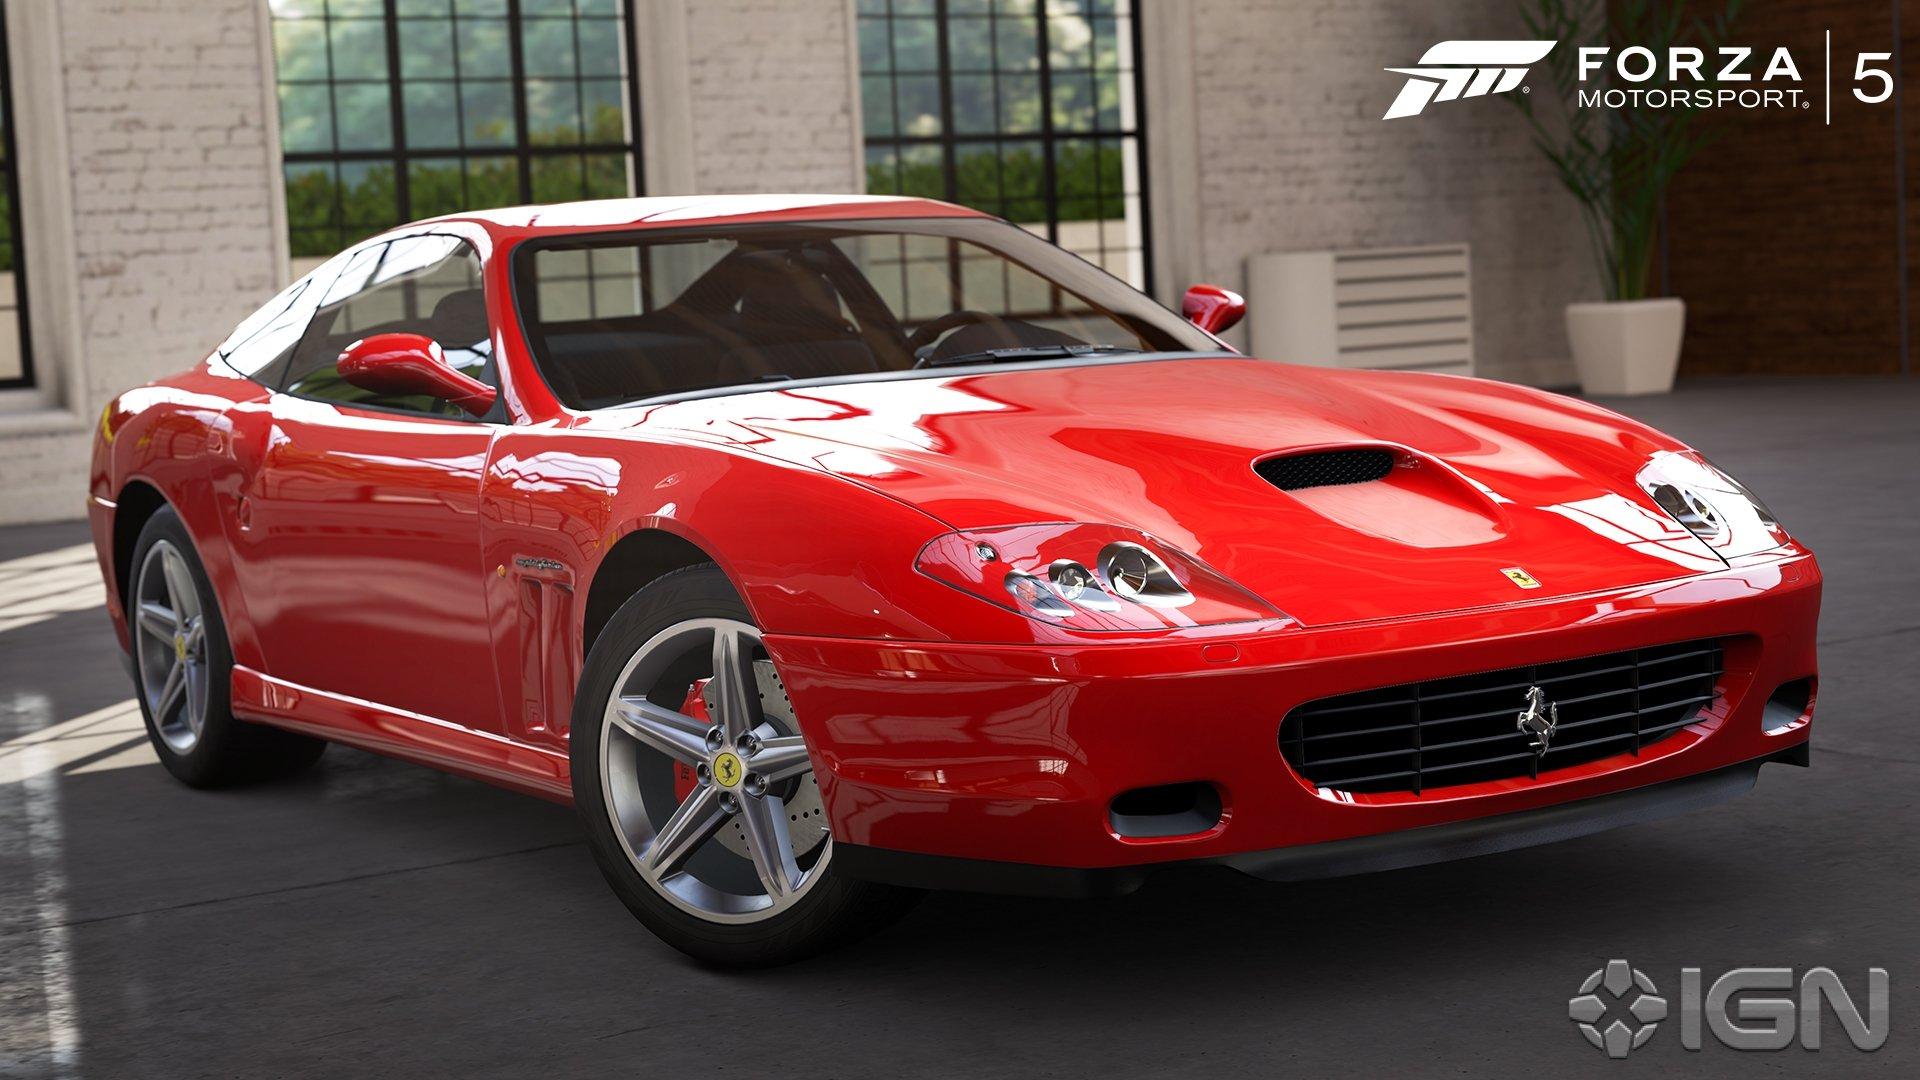 Forza Motorsport 5 Ign Car Pack Released Inside Sim Racing